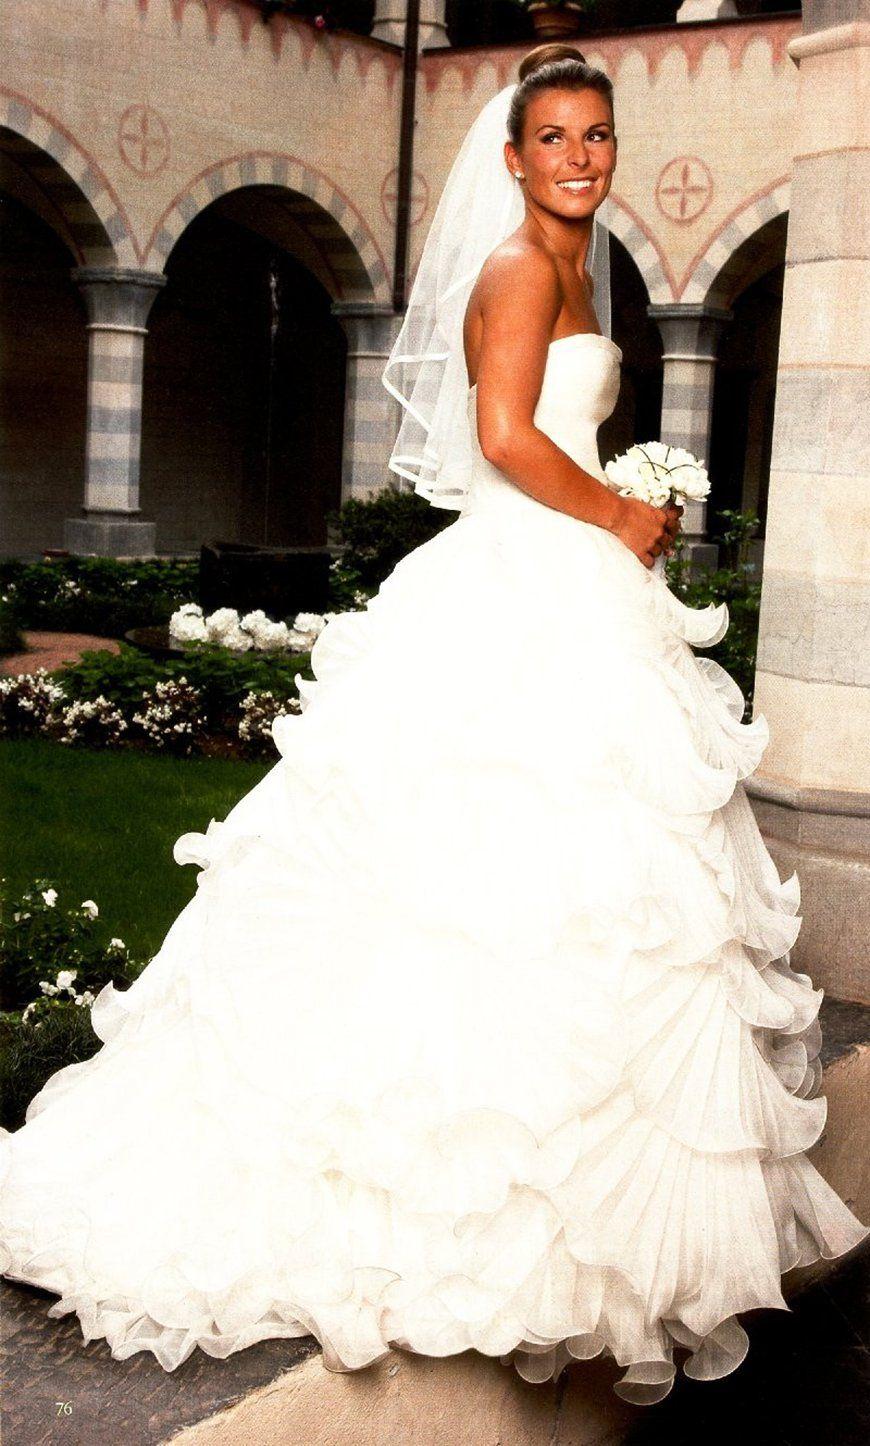 Wedding dresses celebrity wedding dresses celebrity weddings wedding dresses celebrity wedding dresses celebrity weddings ombrellifo Image collections